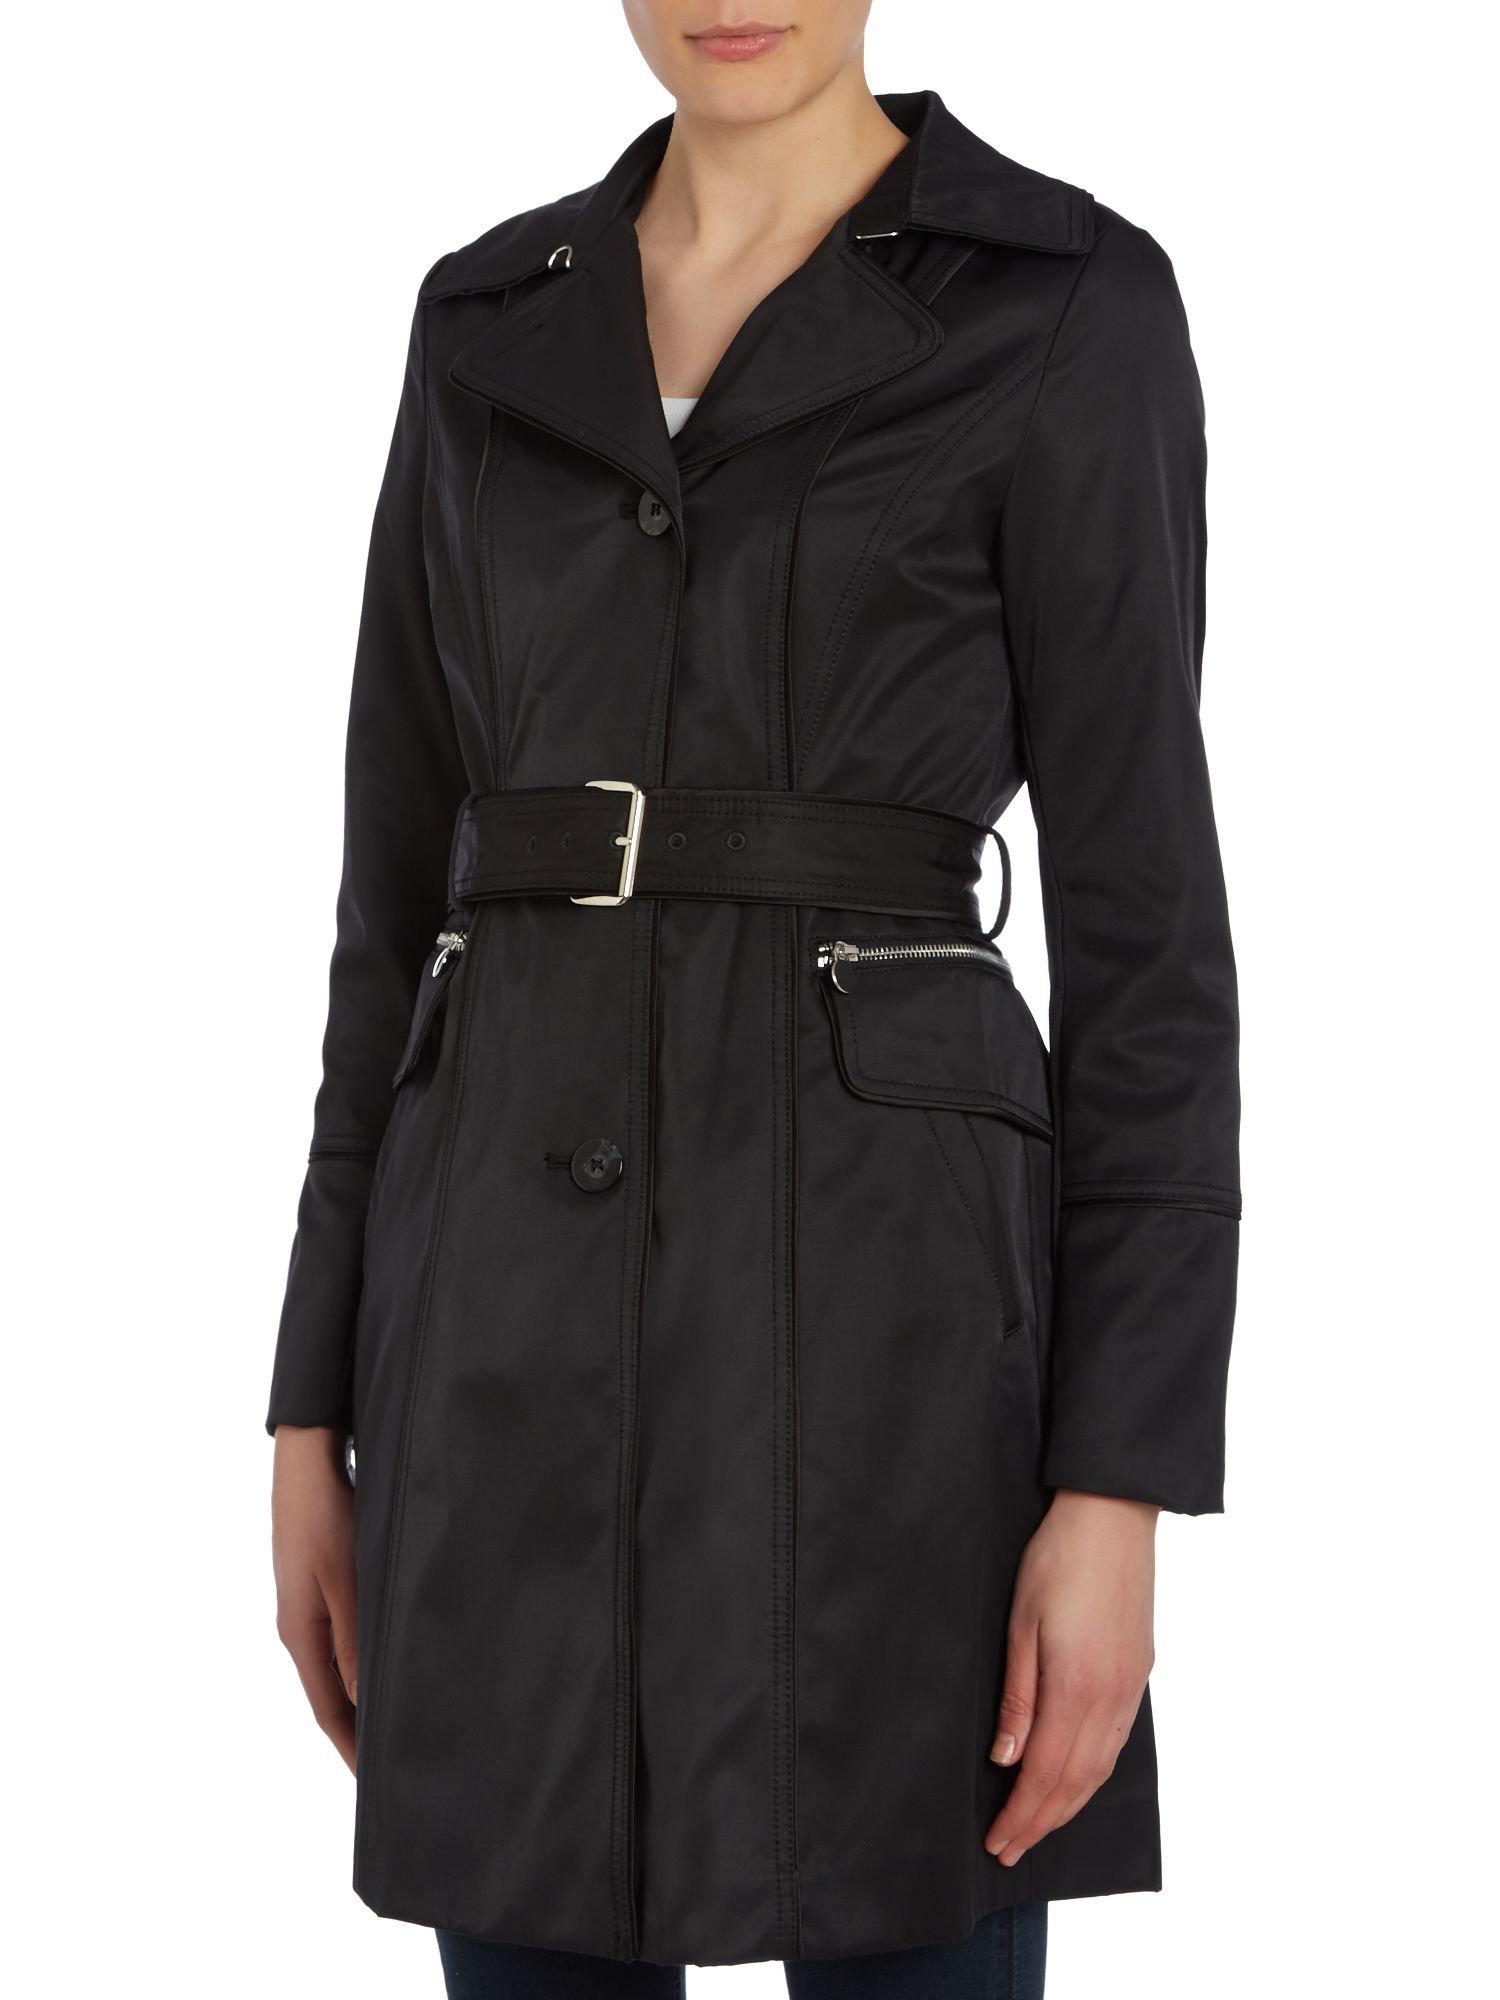 Dawn Levy Rain Coat in Black